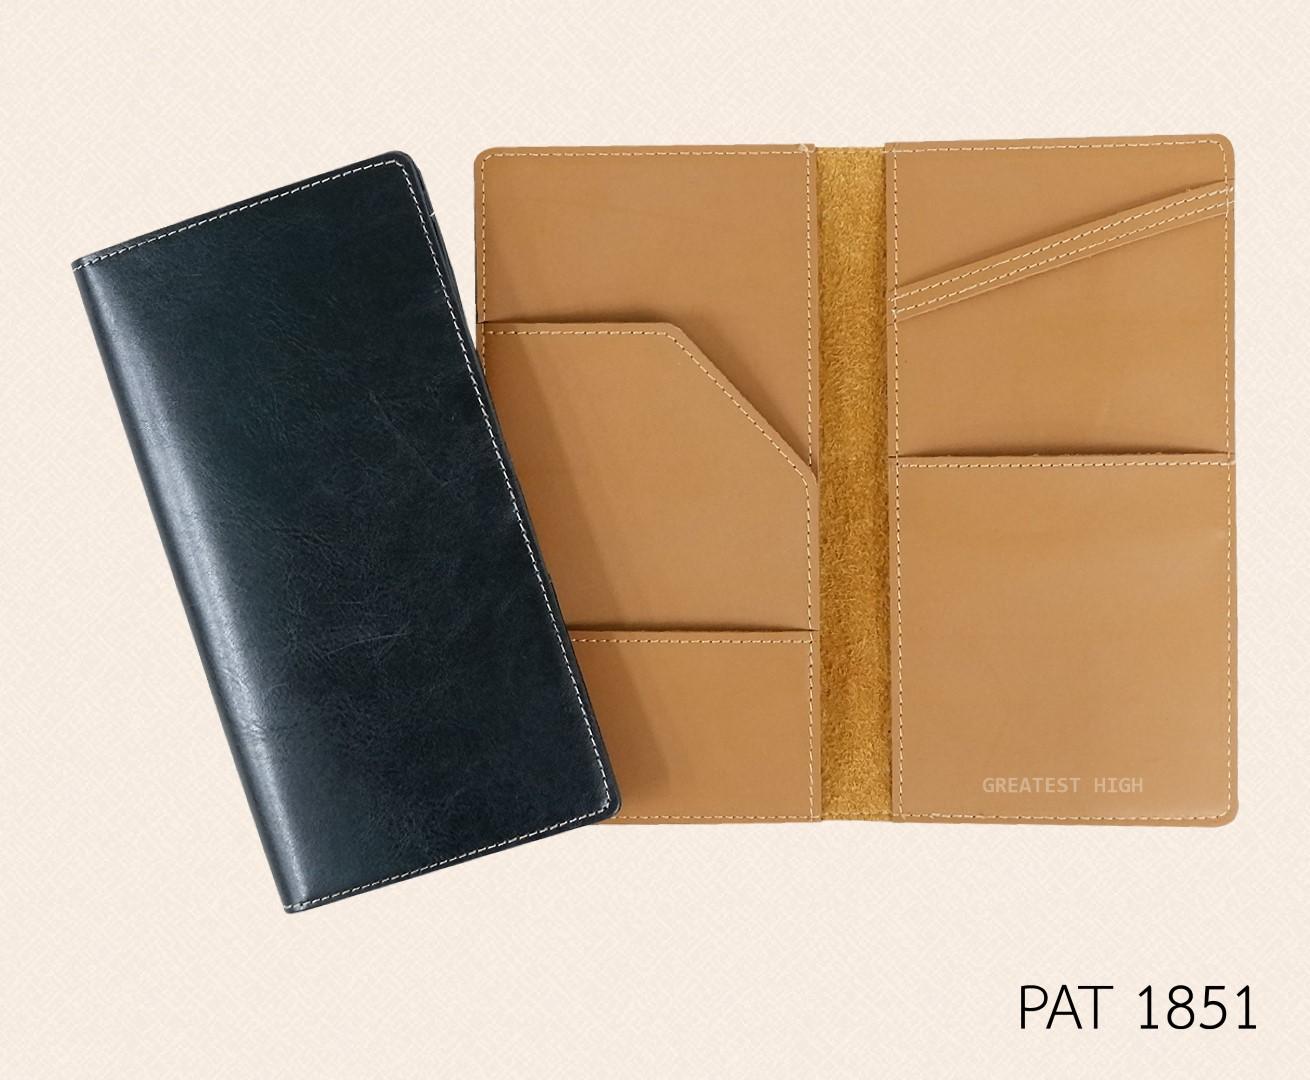 Air ticket and Passport holder :  PAT 1851